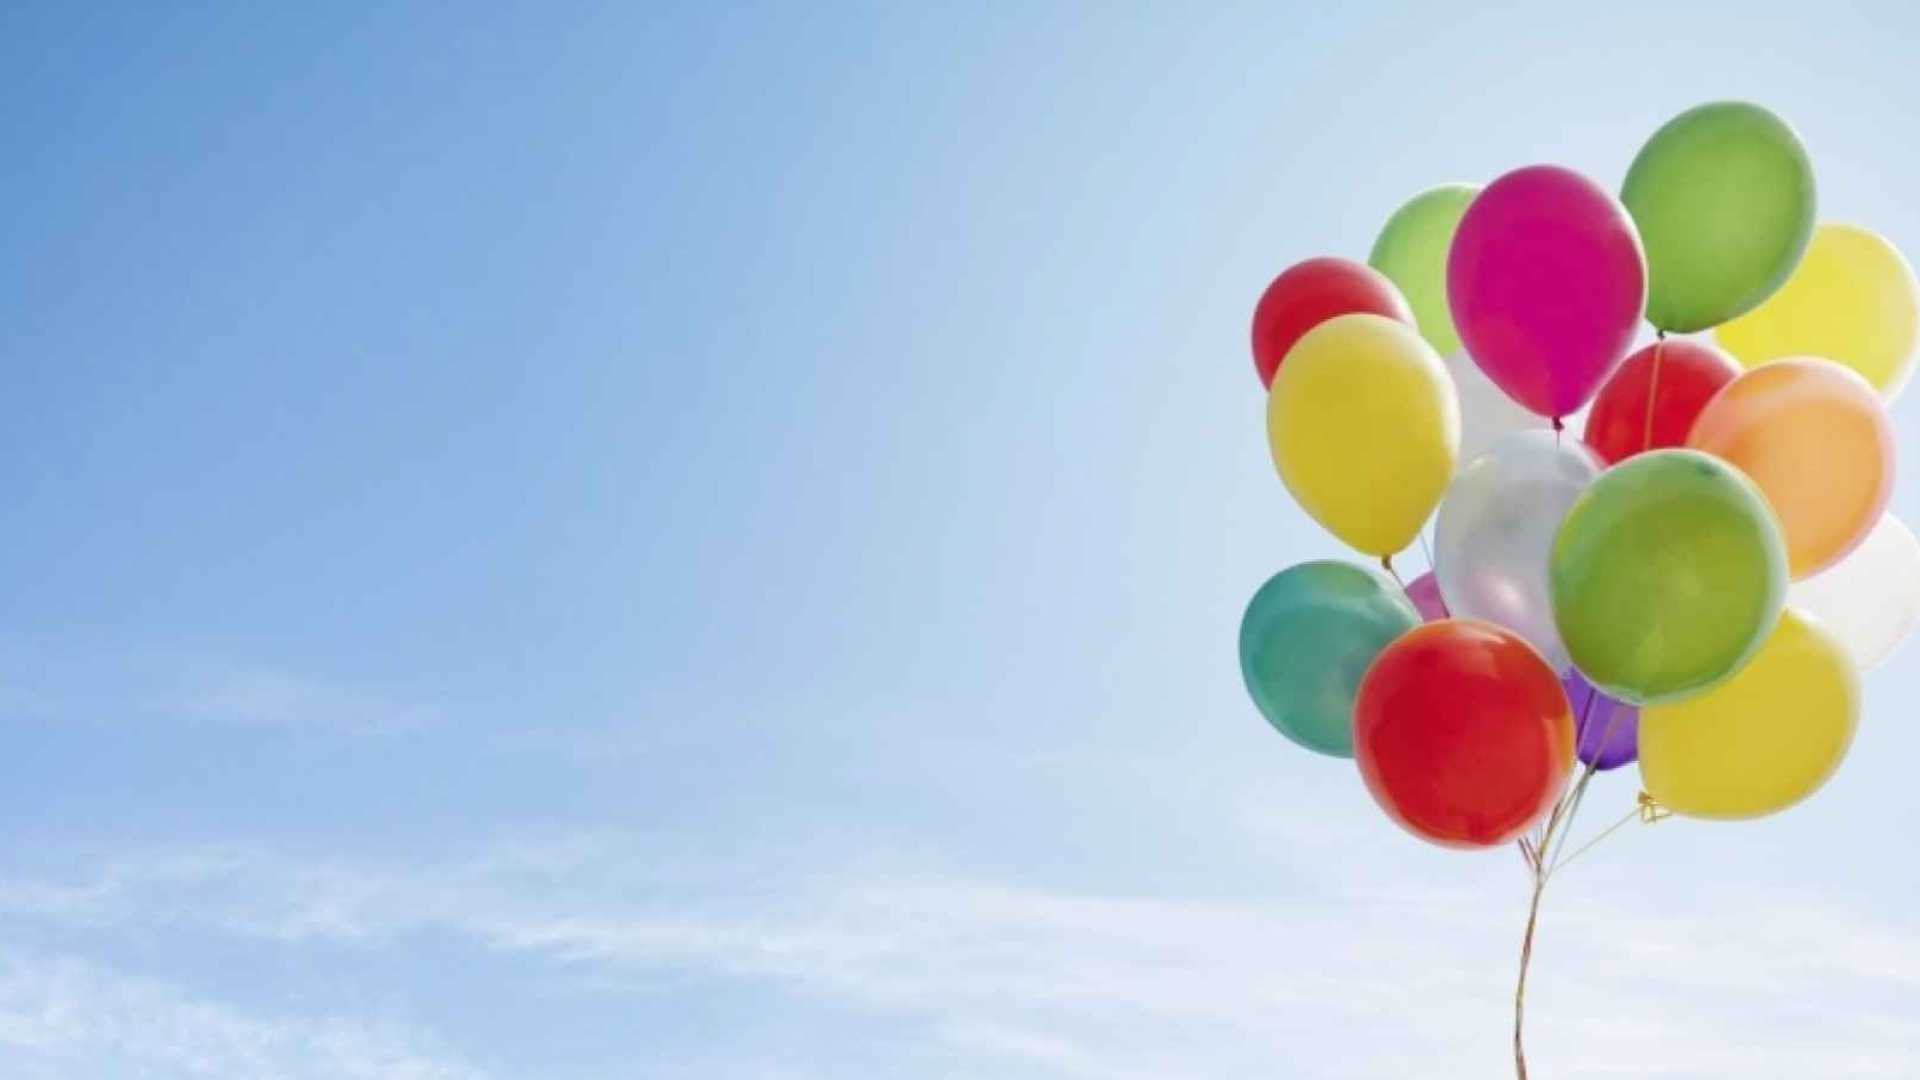 10 Heartwarming Stories of Incredible Customer Service